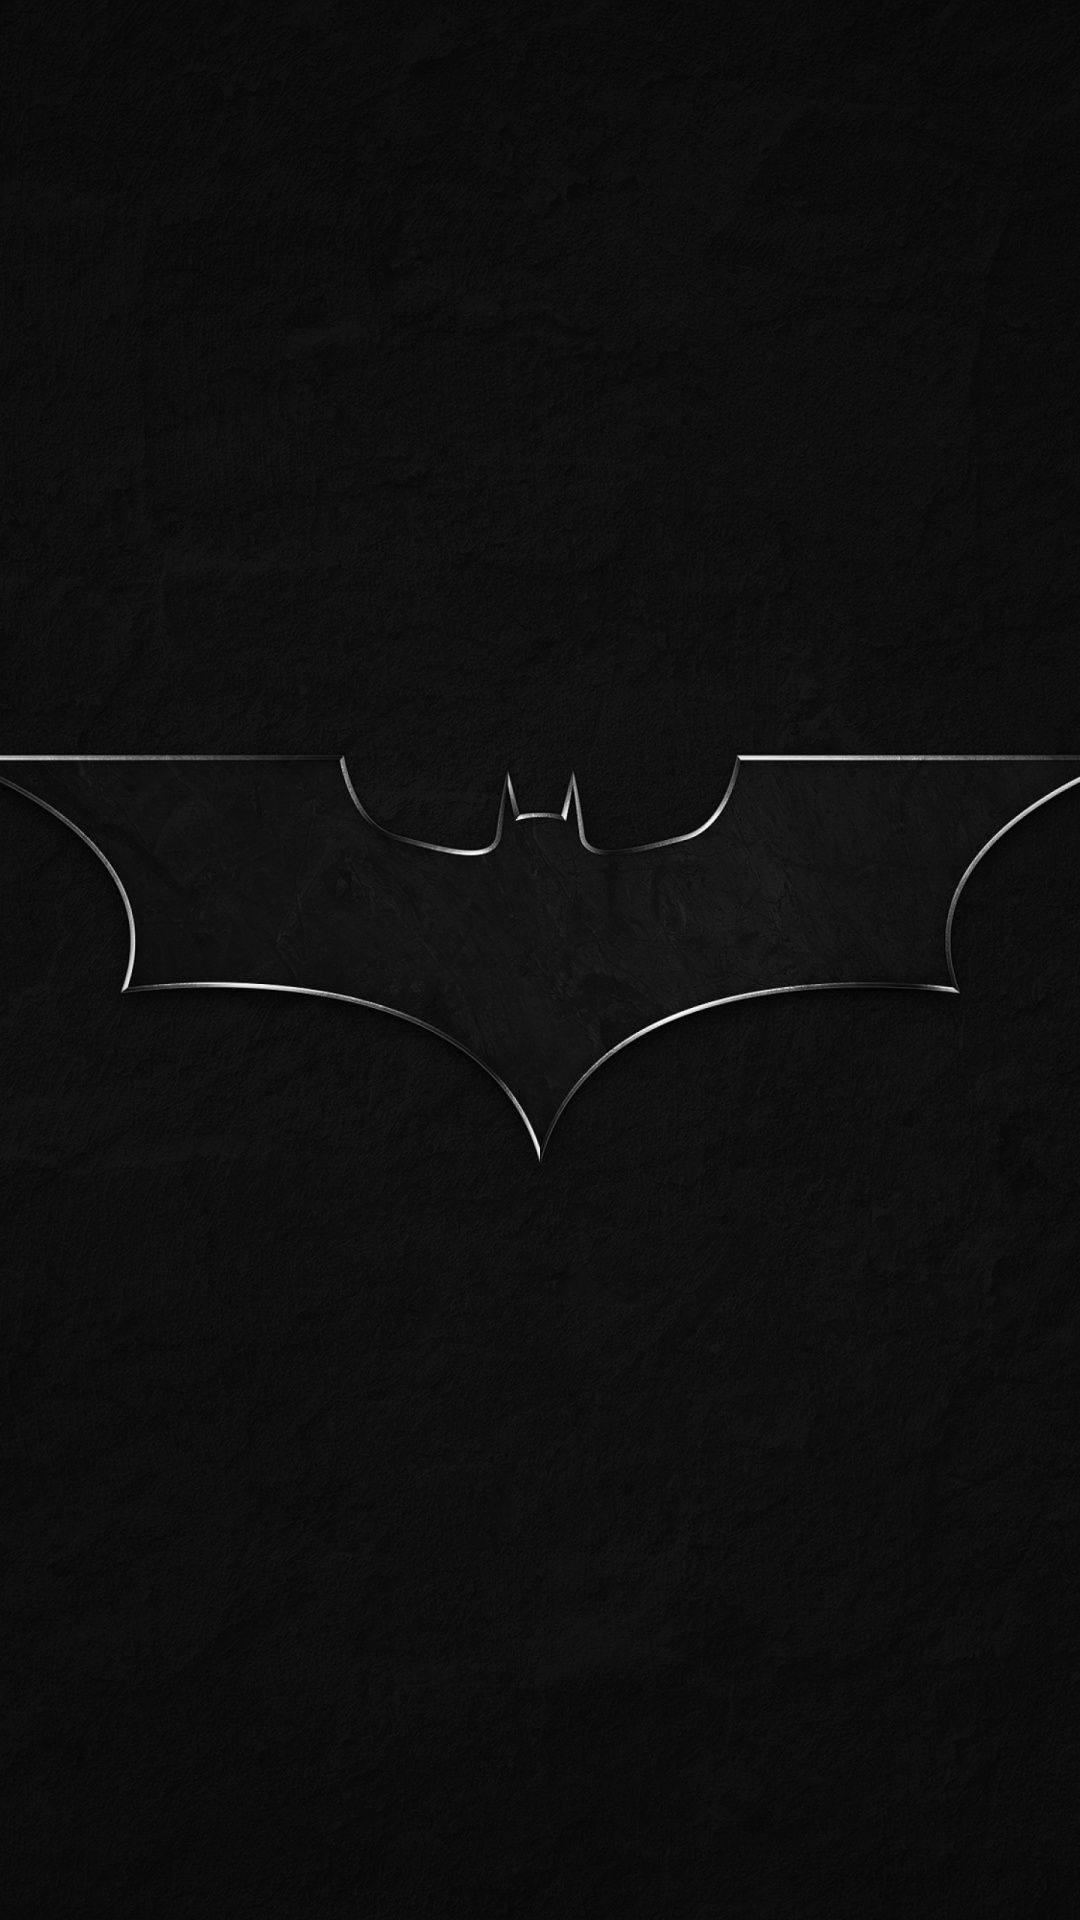 Downloadwallpaper Bat, Line, Monochrome, Text, Black And White